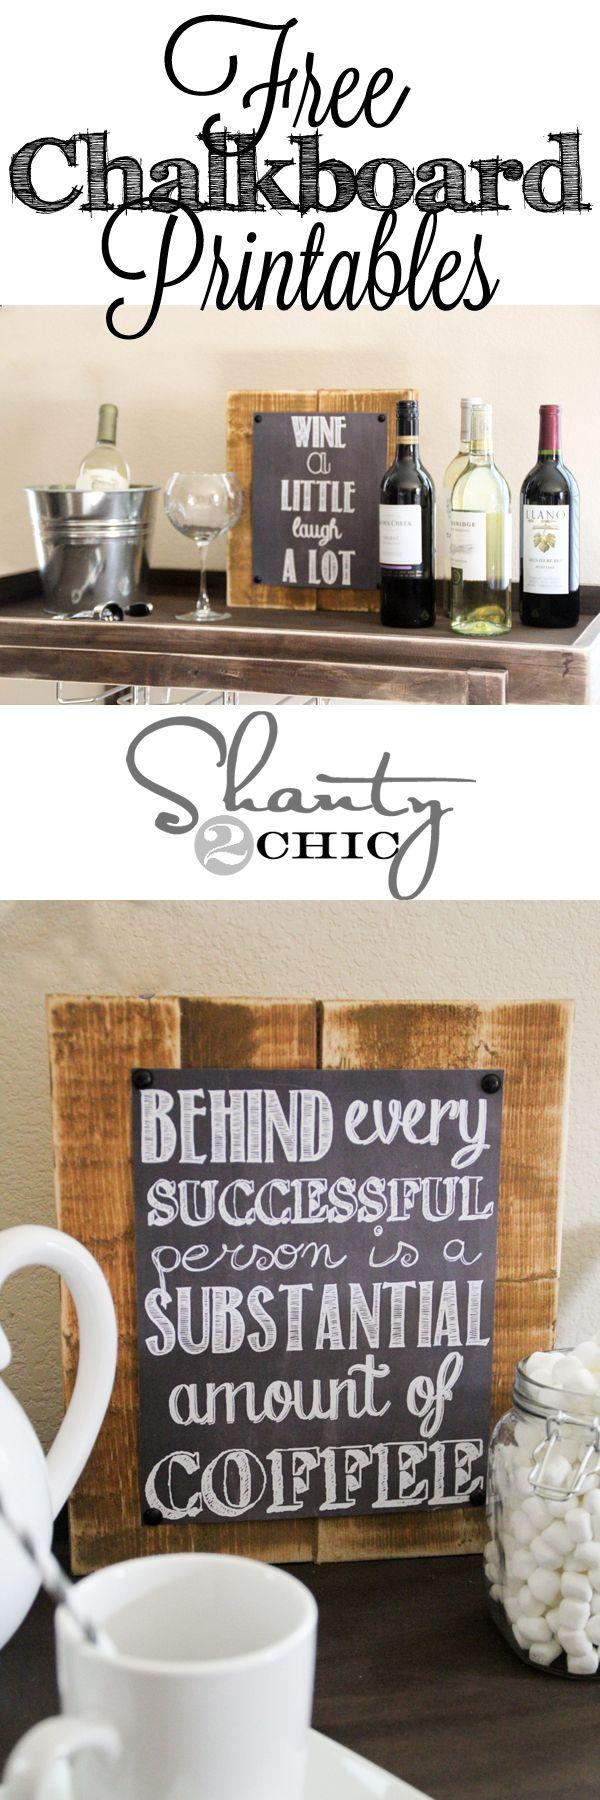 Cute Chalkboard Printable signs! FREE!